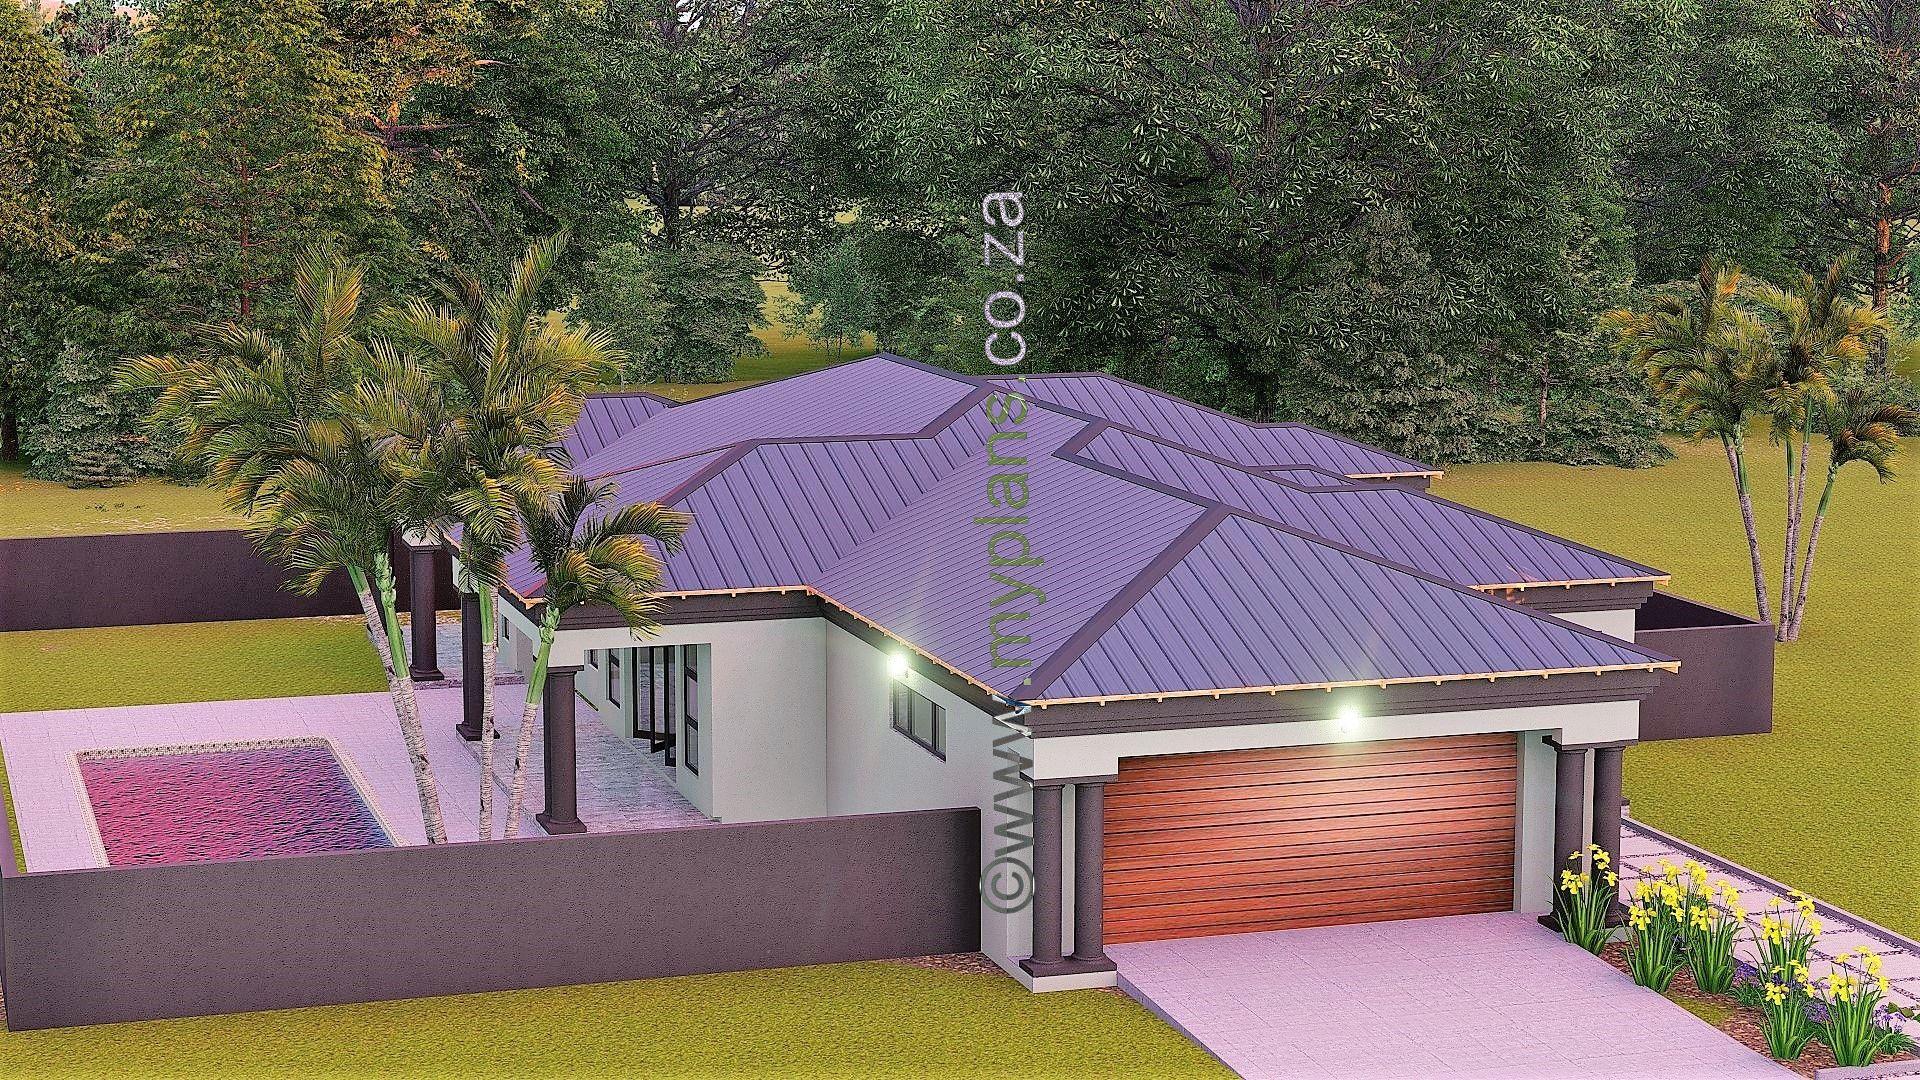 3 Bedroom House Plan Bla 074s My House Plans Porch Roof Design Hip Roof Design